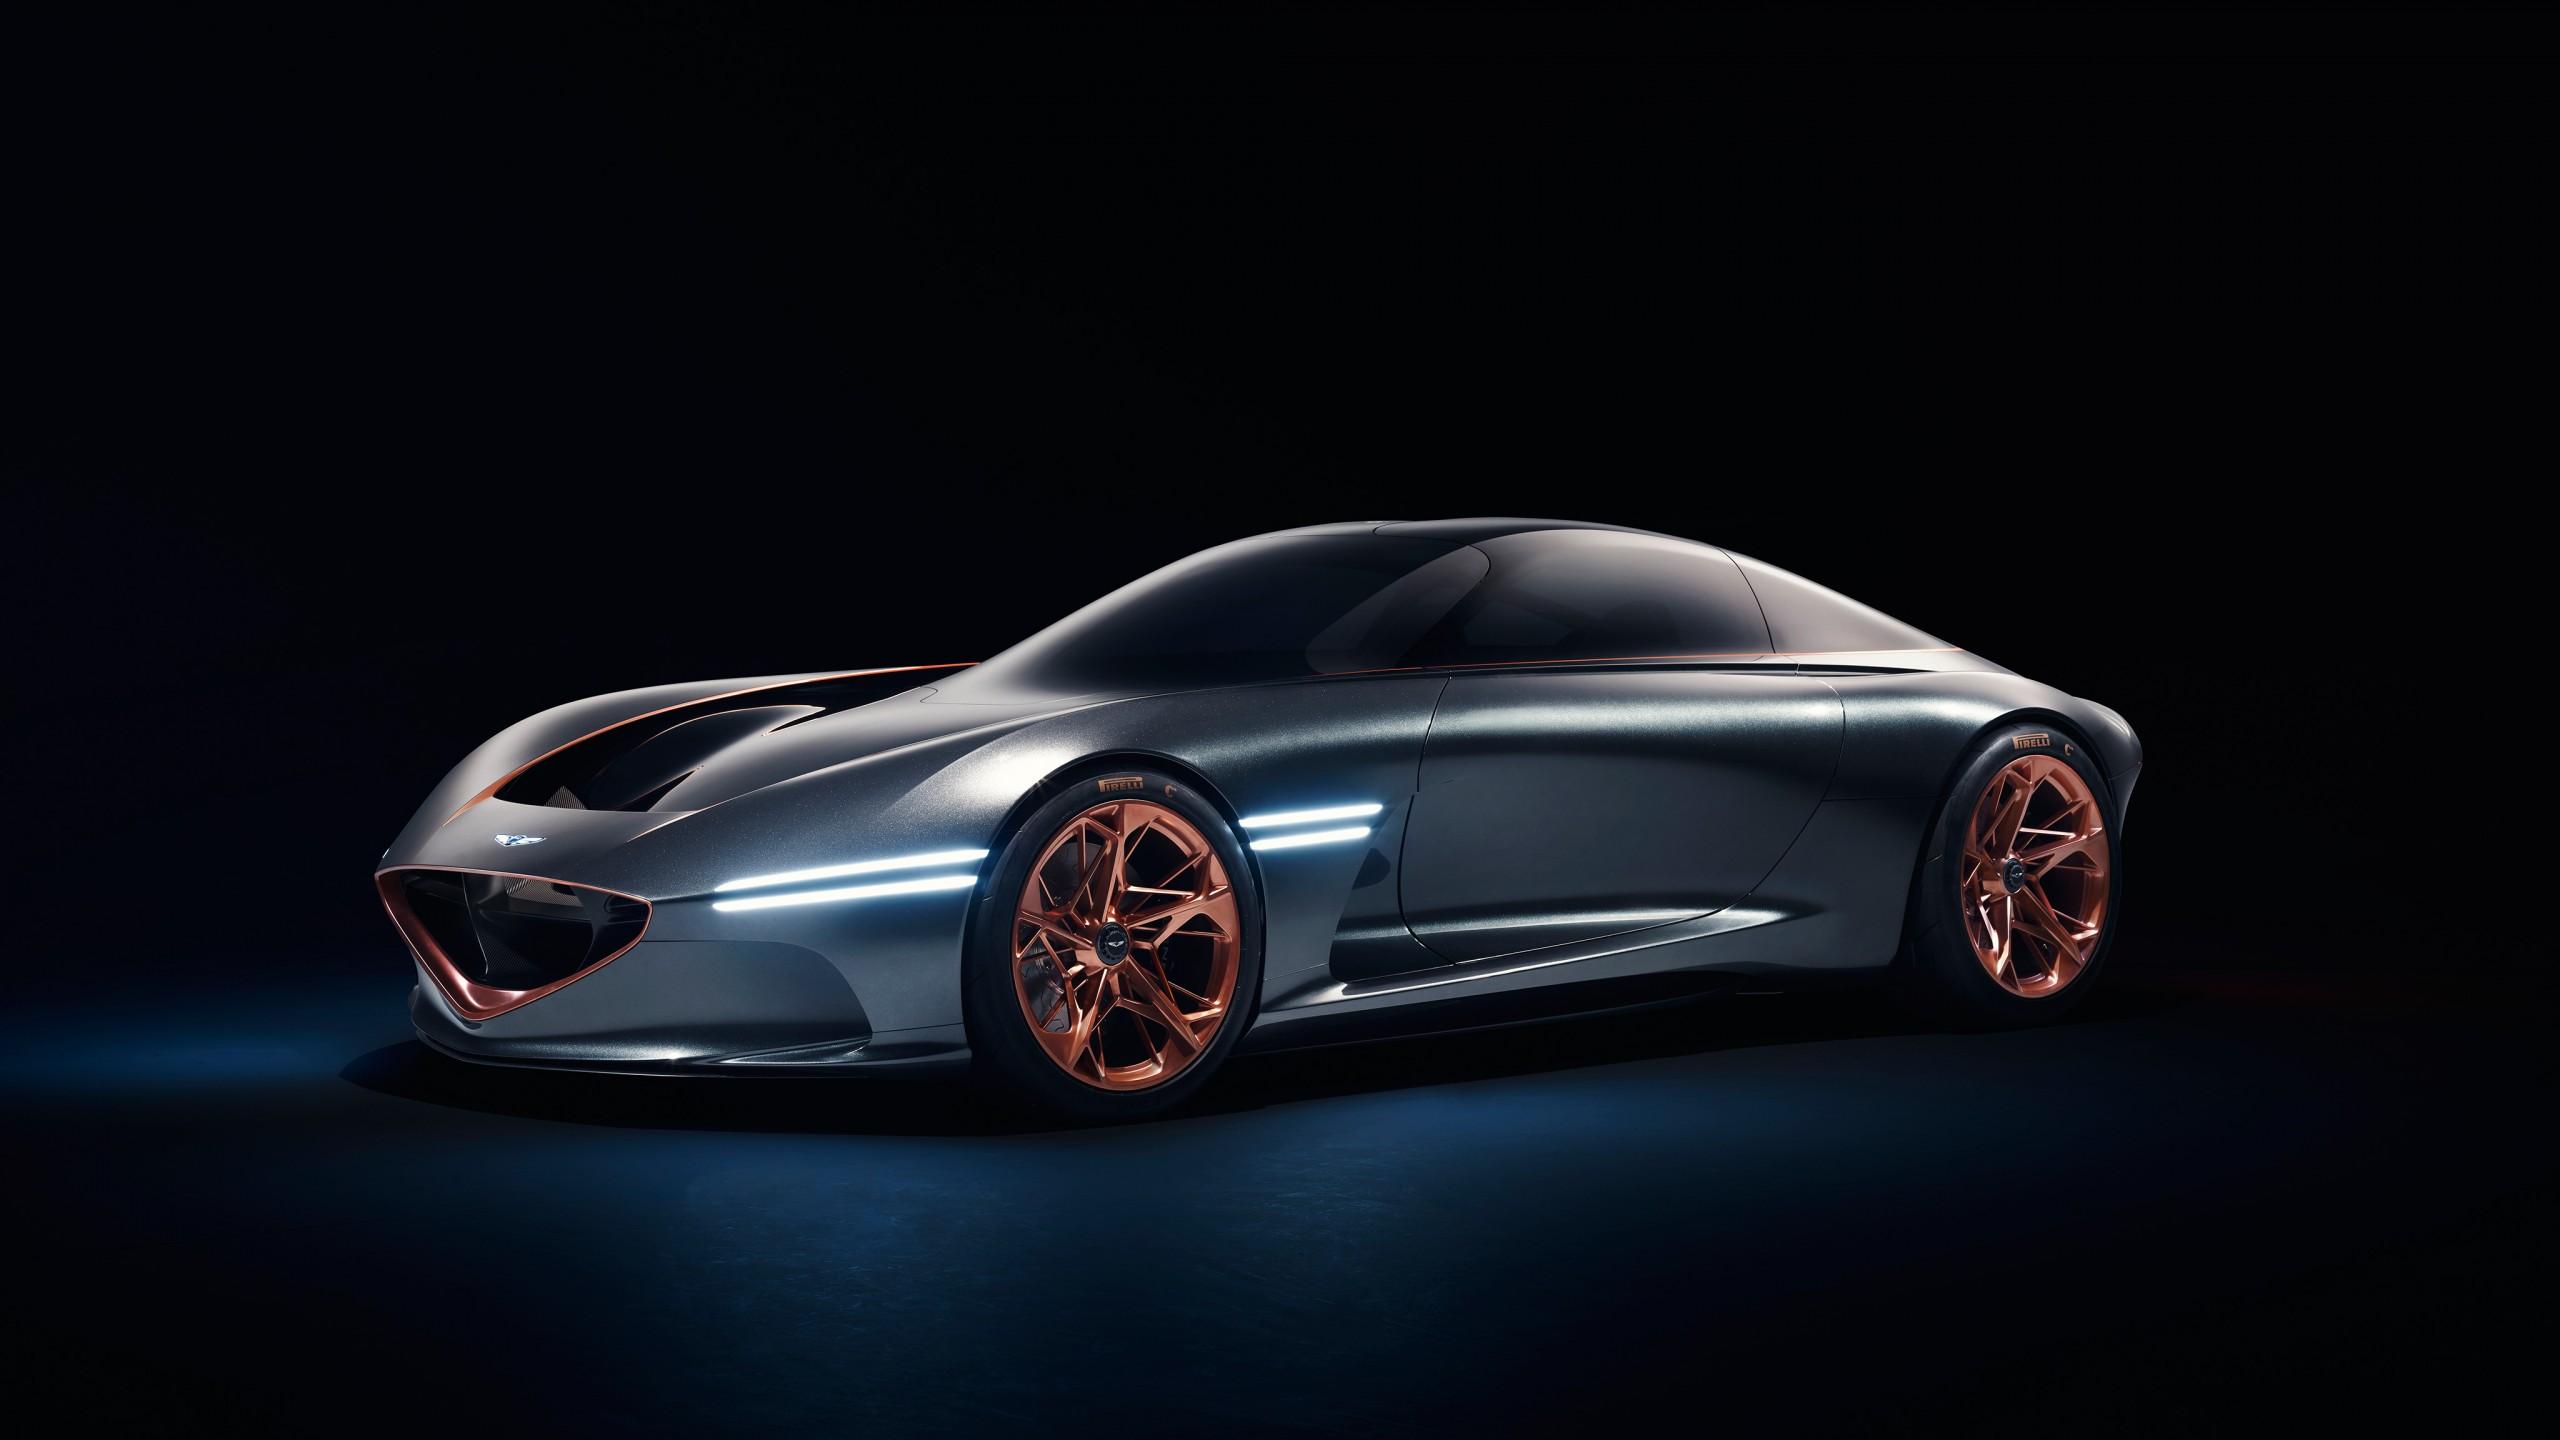 Luxury Car Iphone Wallpaper 2018 Genesis Essentia Concept 4k 5 Wallpaper Hd Car